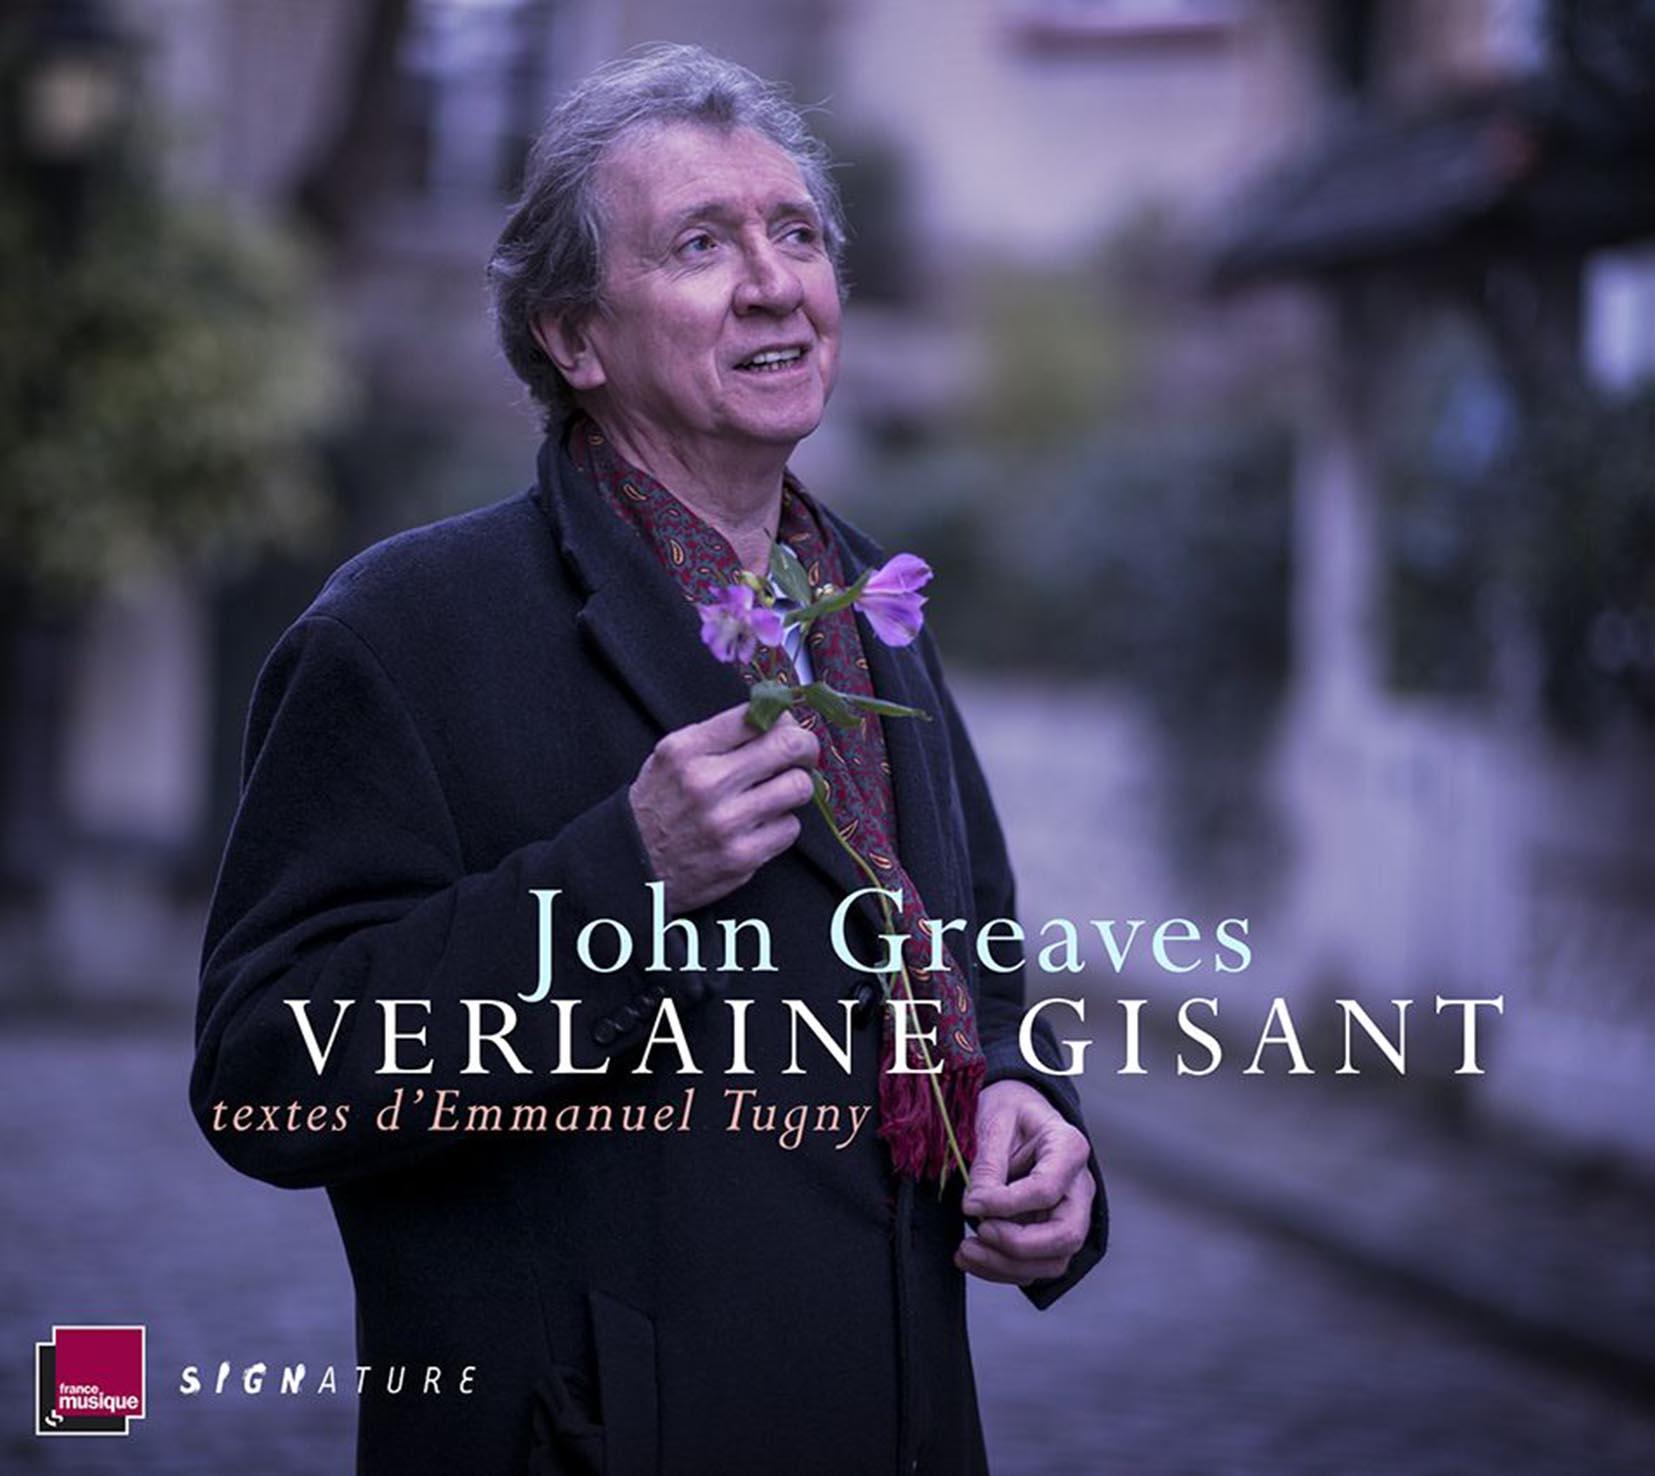 Verlaine gisant : textes d'Emmanuel Tugny   Greaves, John